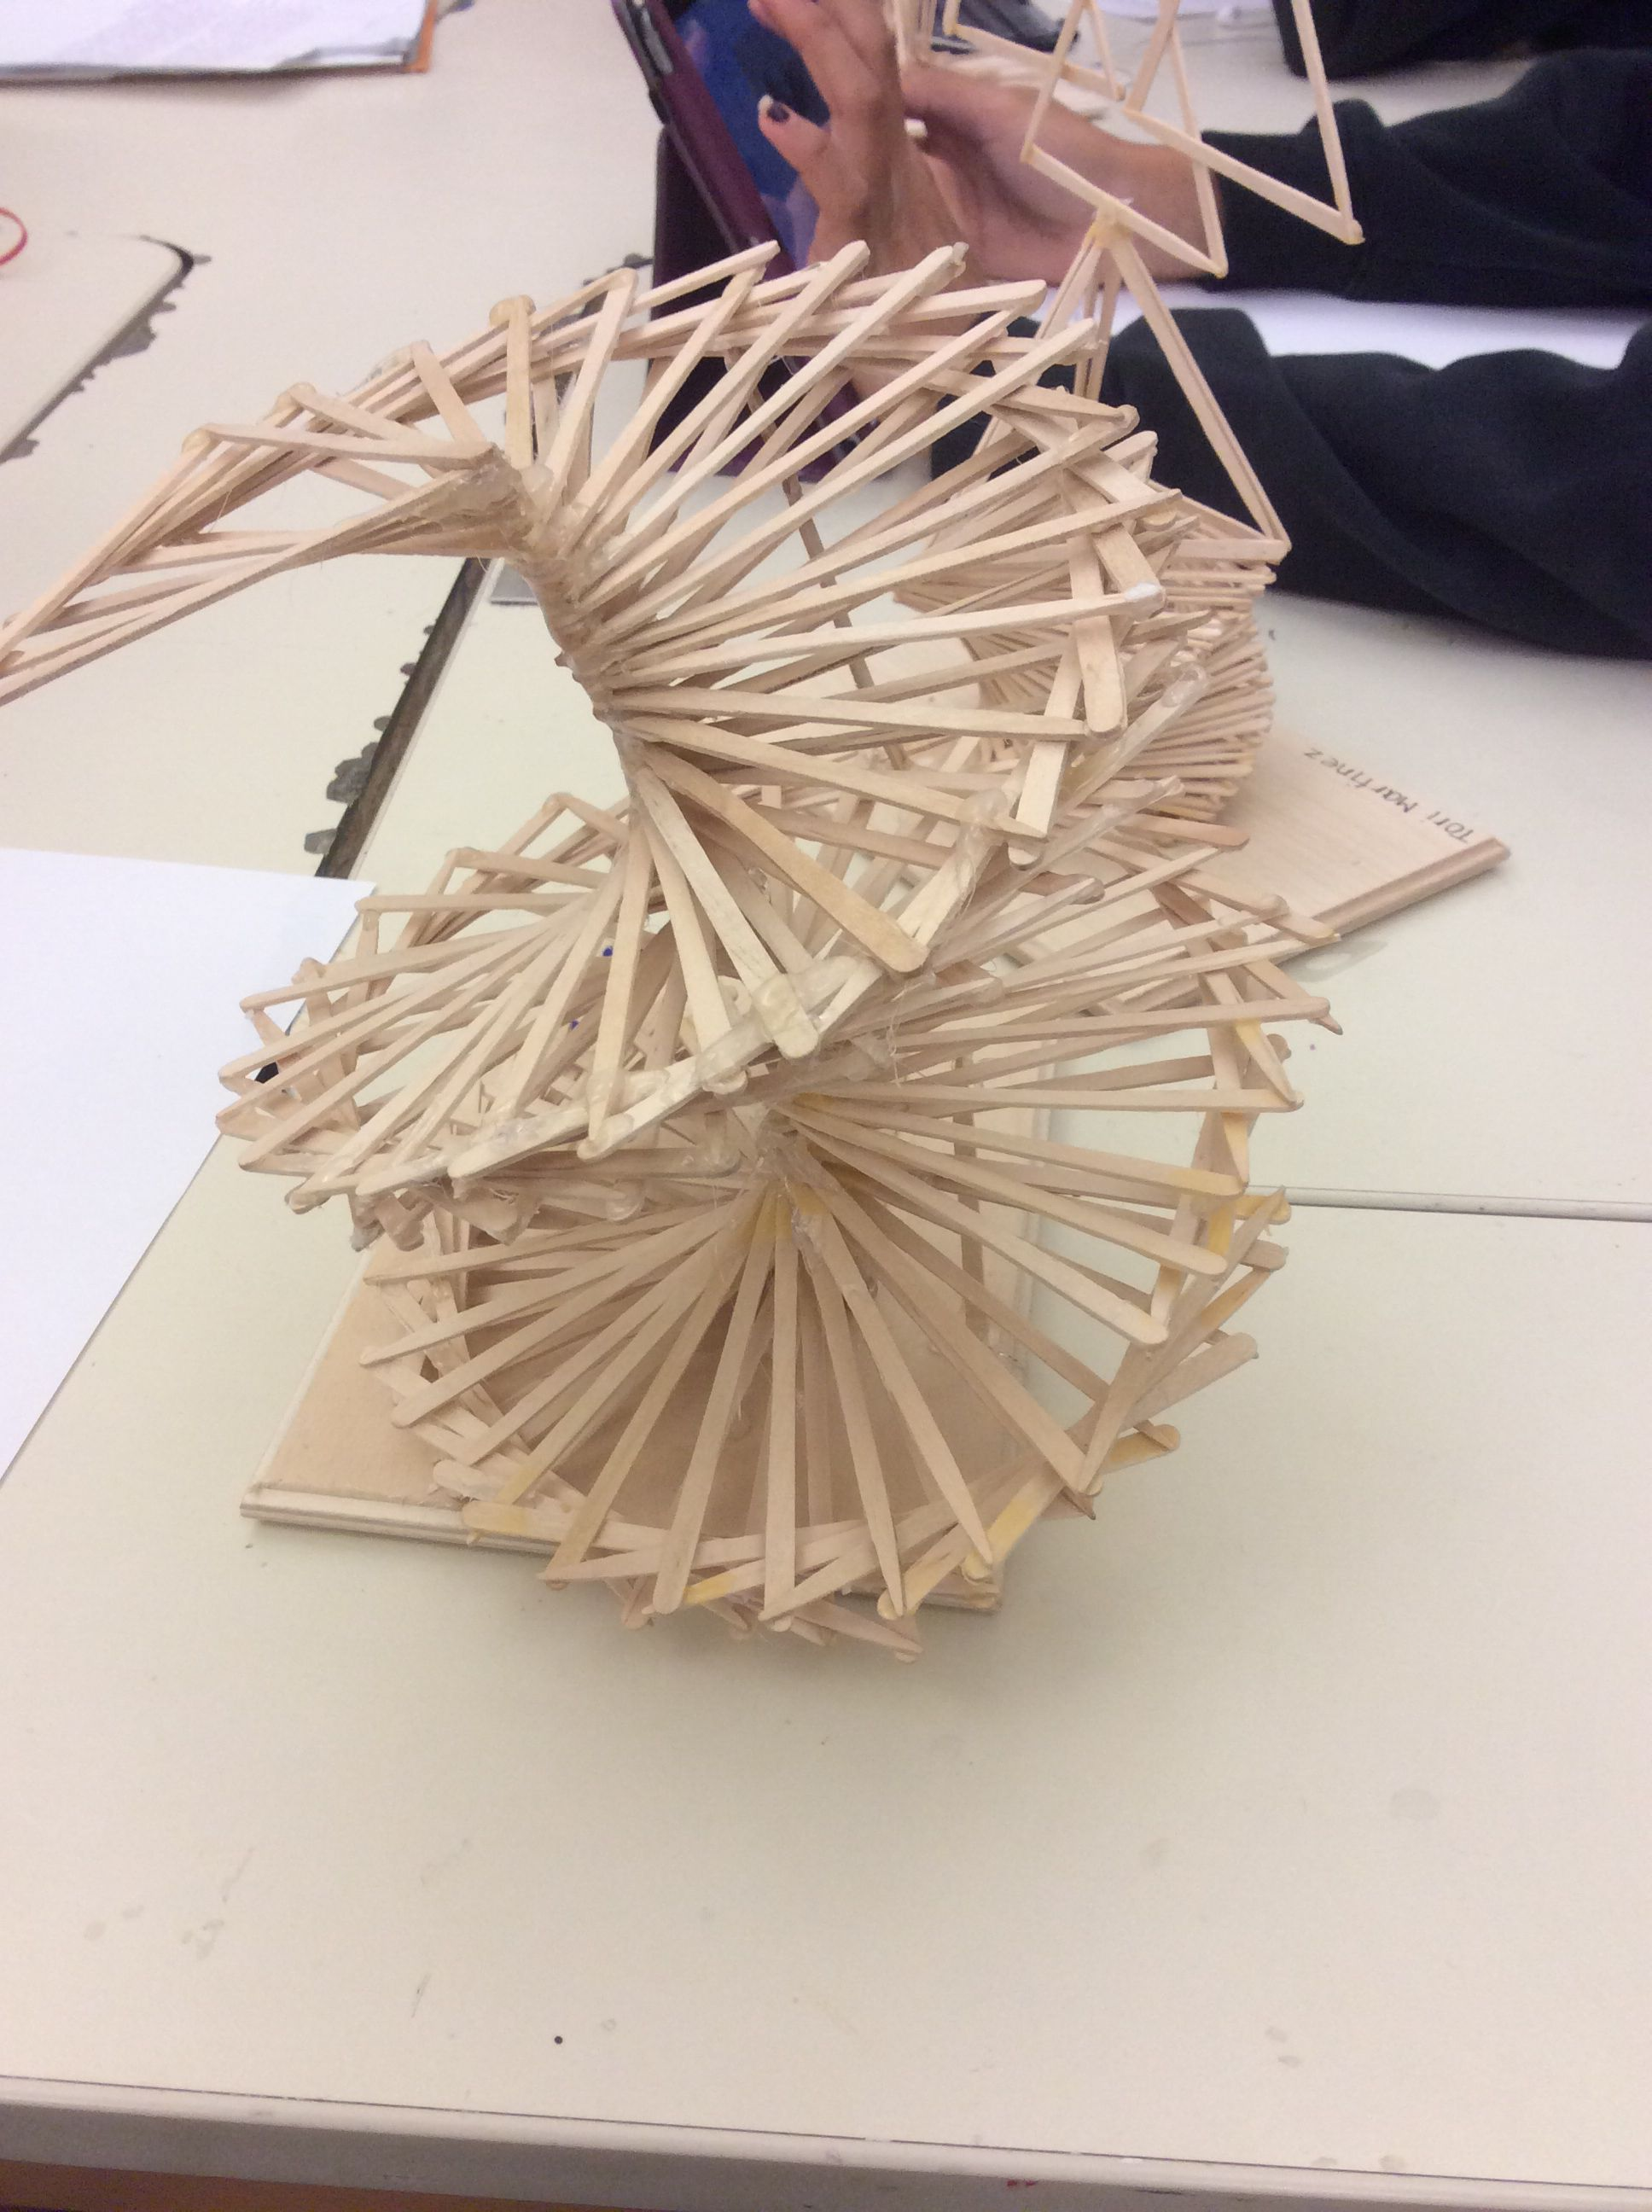 Modular sculpture glue wooden sticks we had to make a